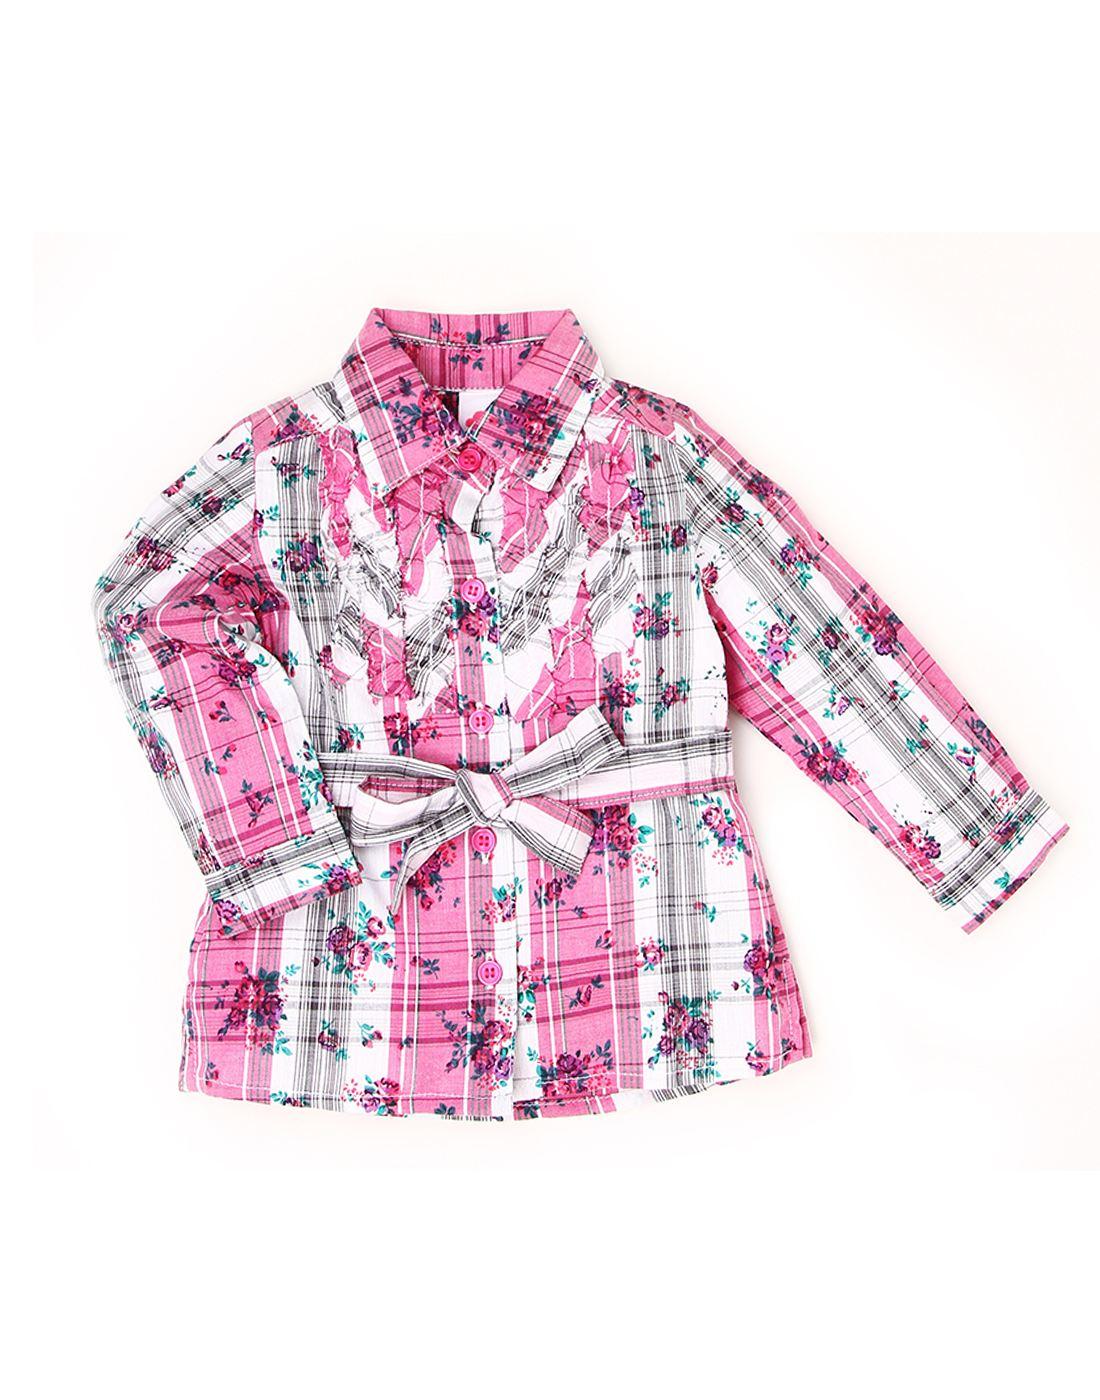 K.C.O 89 Girls Casual Printed Full Sleeve Top